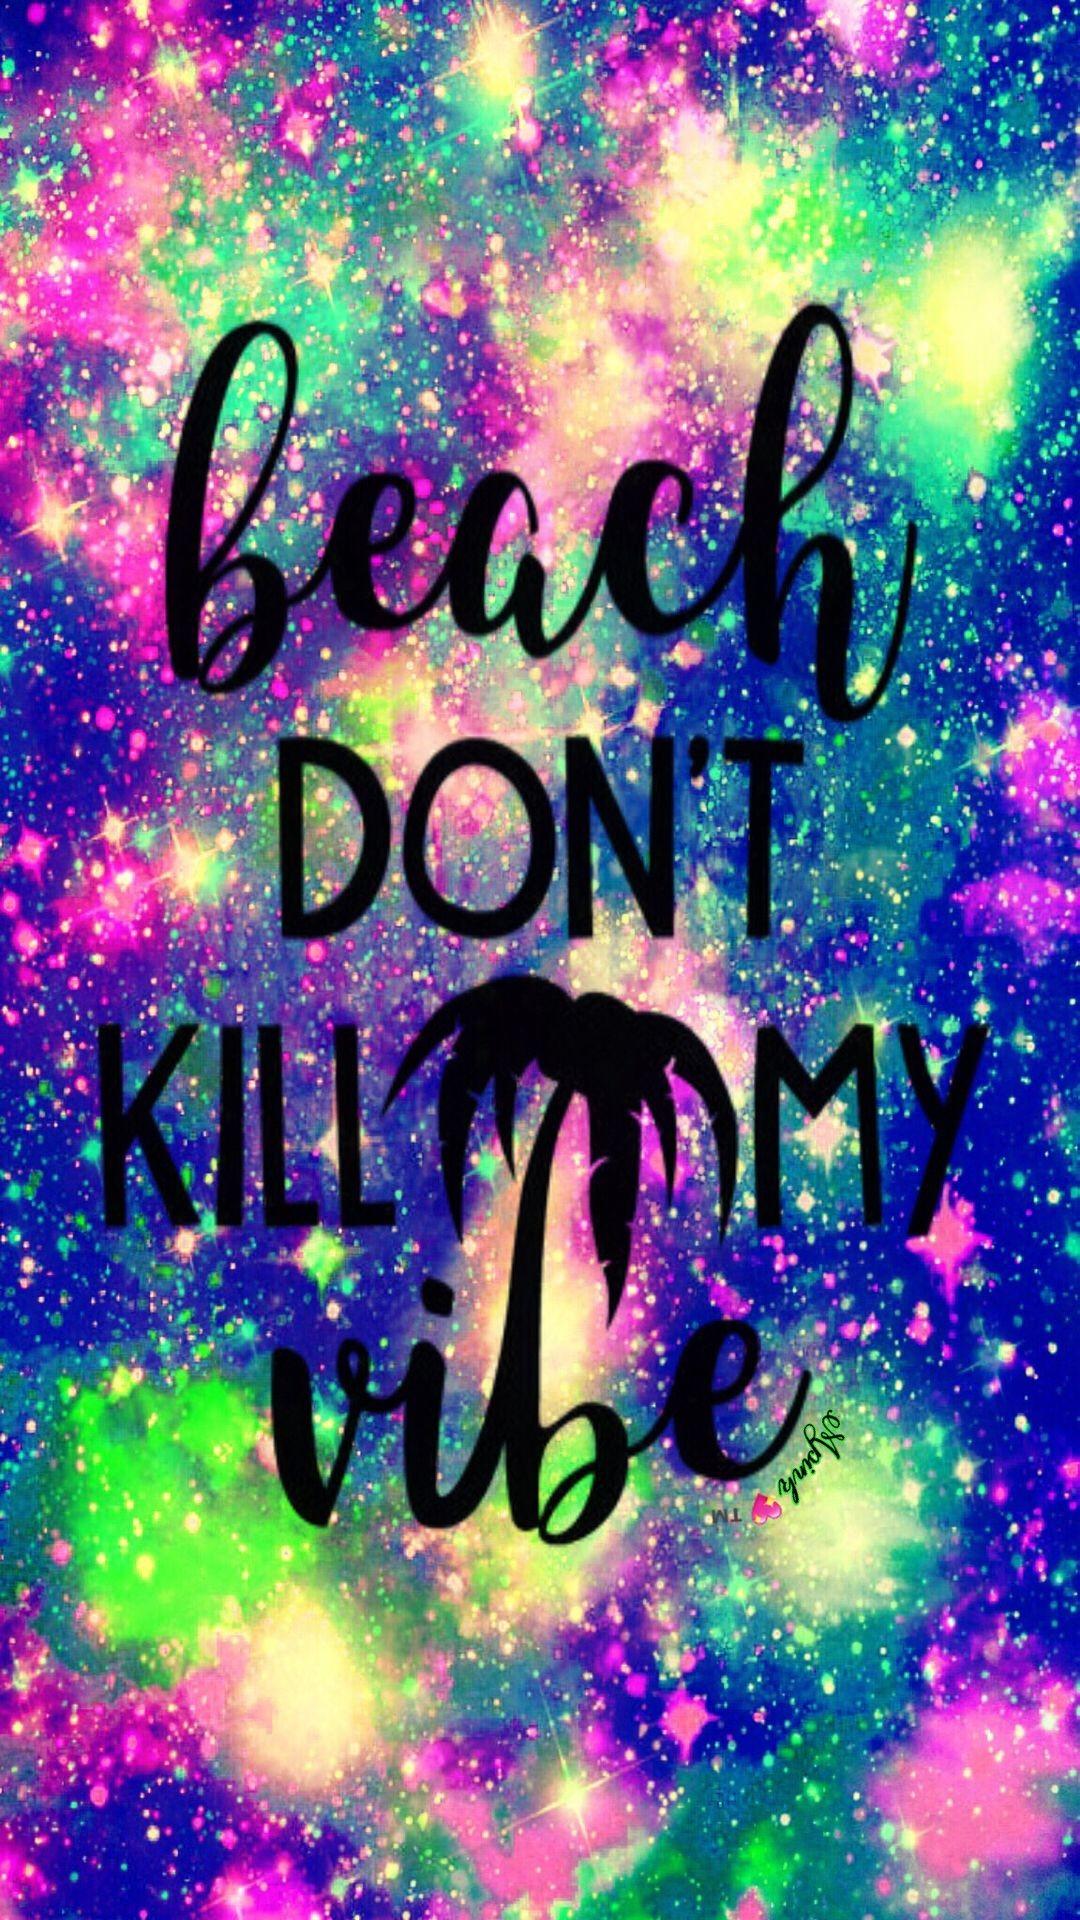 Res: 1080x1920, Beach Don't Kill My Vibe Galaxy Wallpaper #androidwallpaper  #iphonewallpaper #wallpaper #